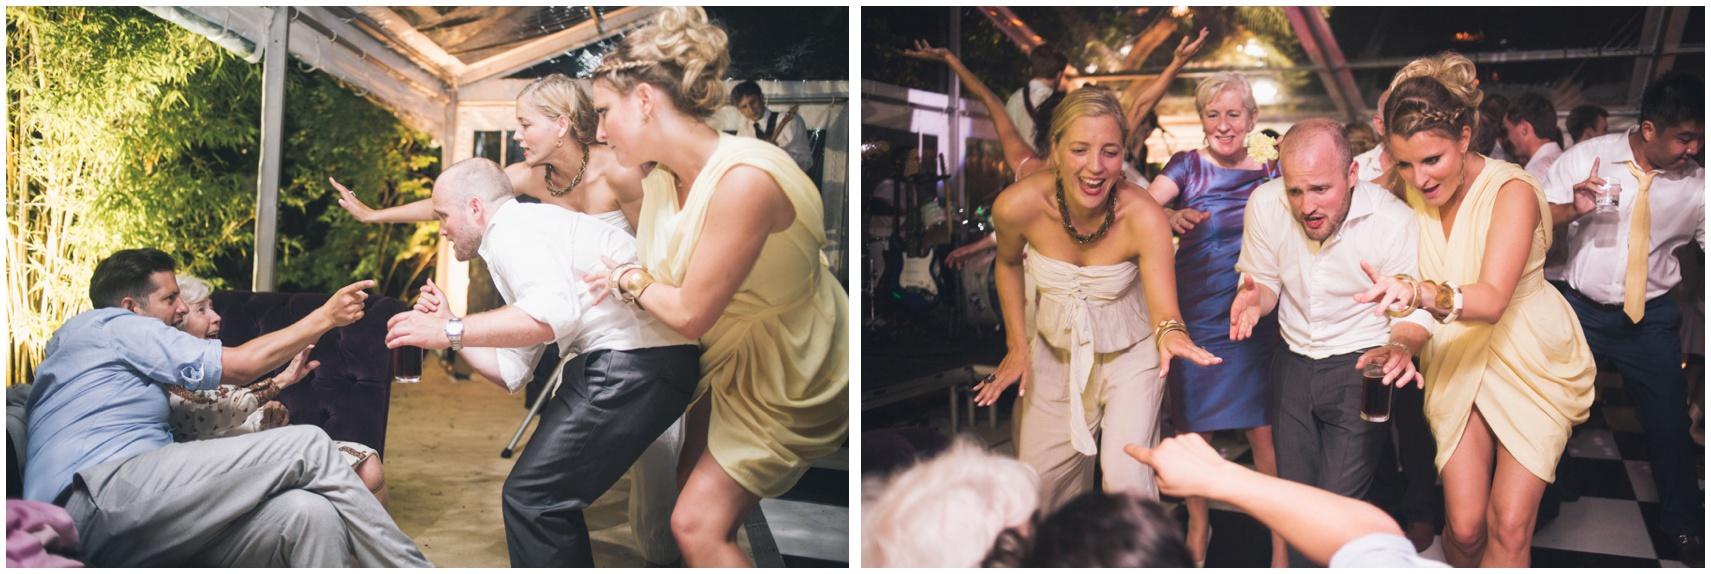 BMC Wedding photography Rutland_0373.jpg